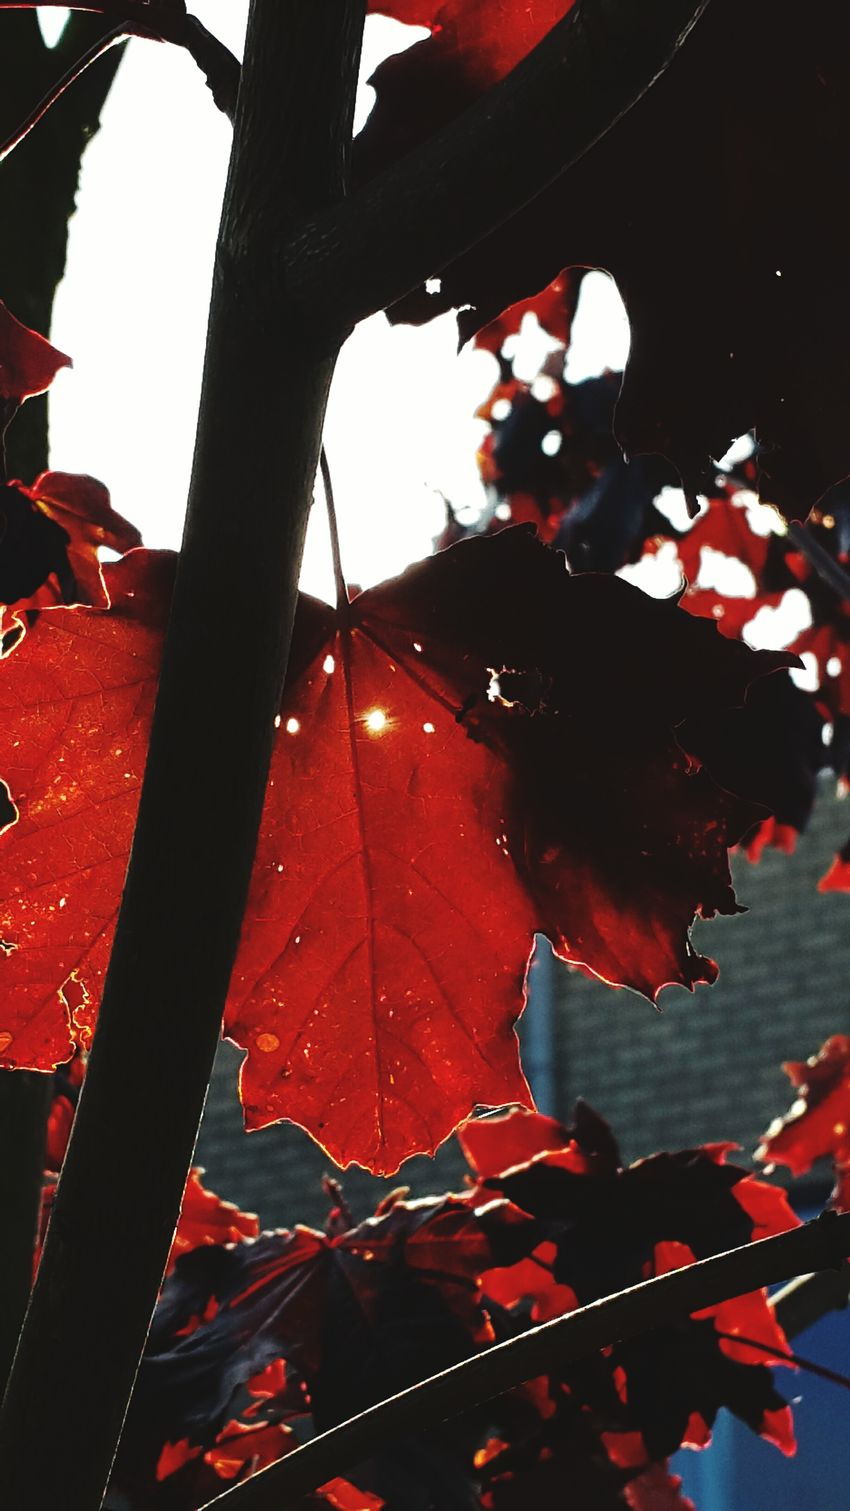 Autumn Autumn Colors Autumn Leaves Herfst...? Herfst Herfstblad Red Sun